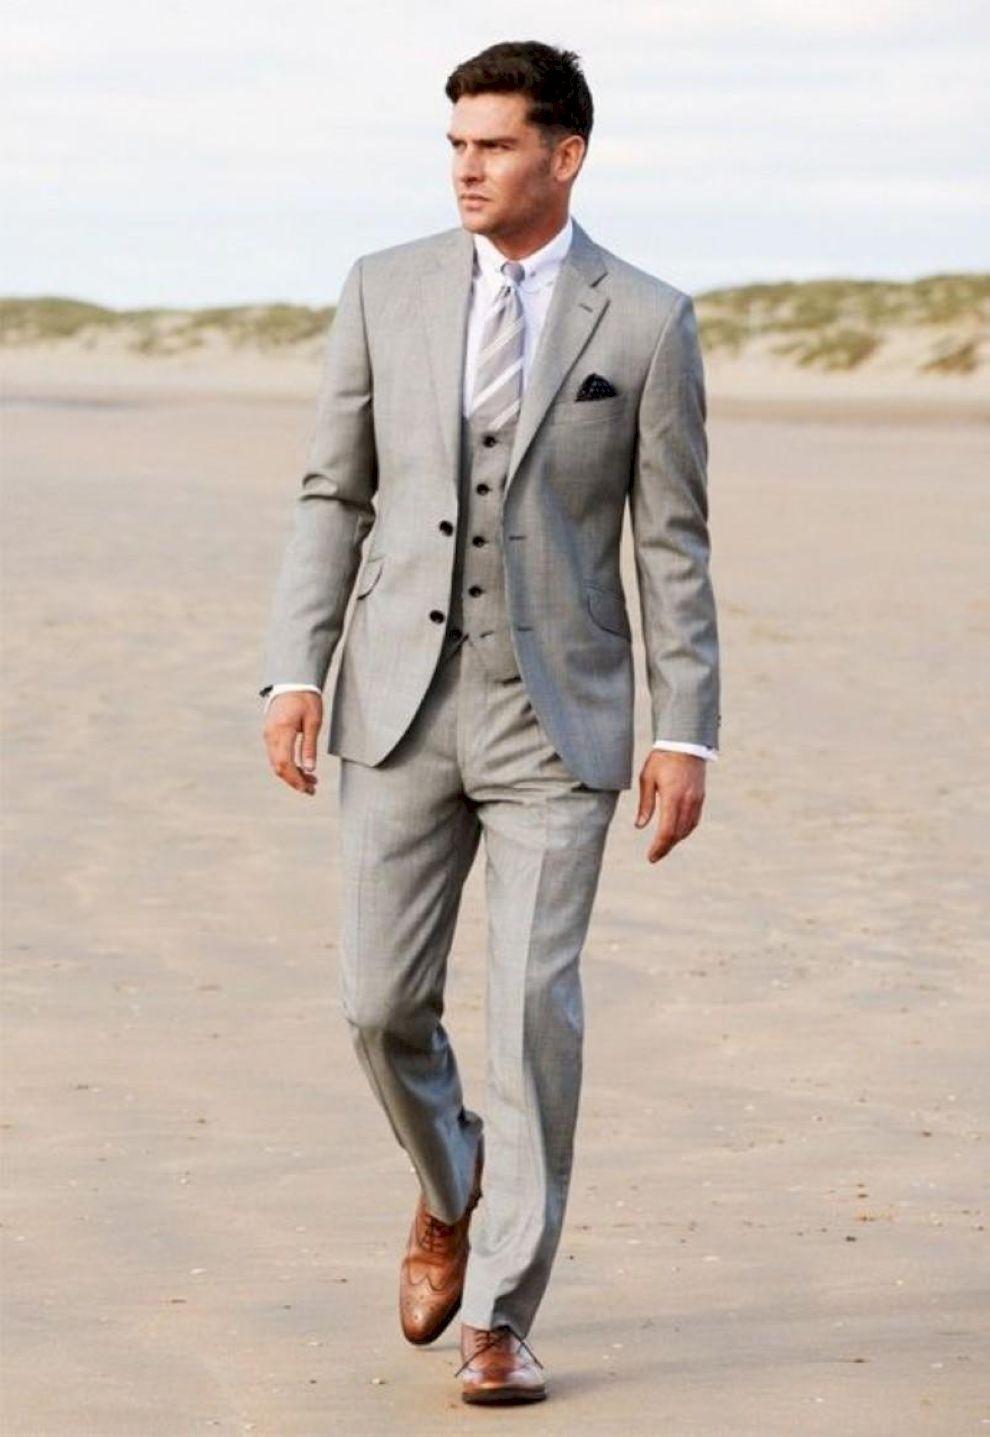 69 Charming Grey Groomsmen Suits Ideas | Gray groomsmen suits ...